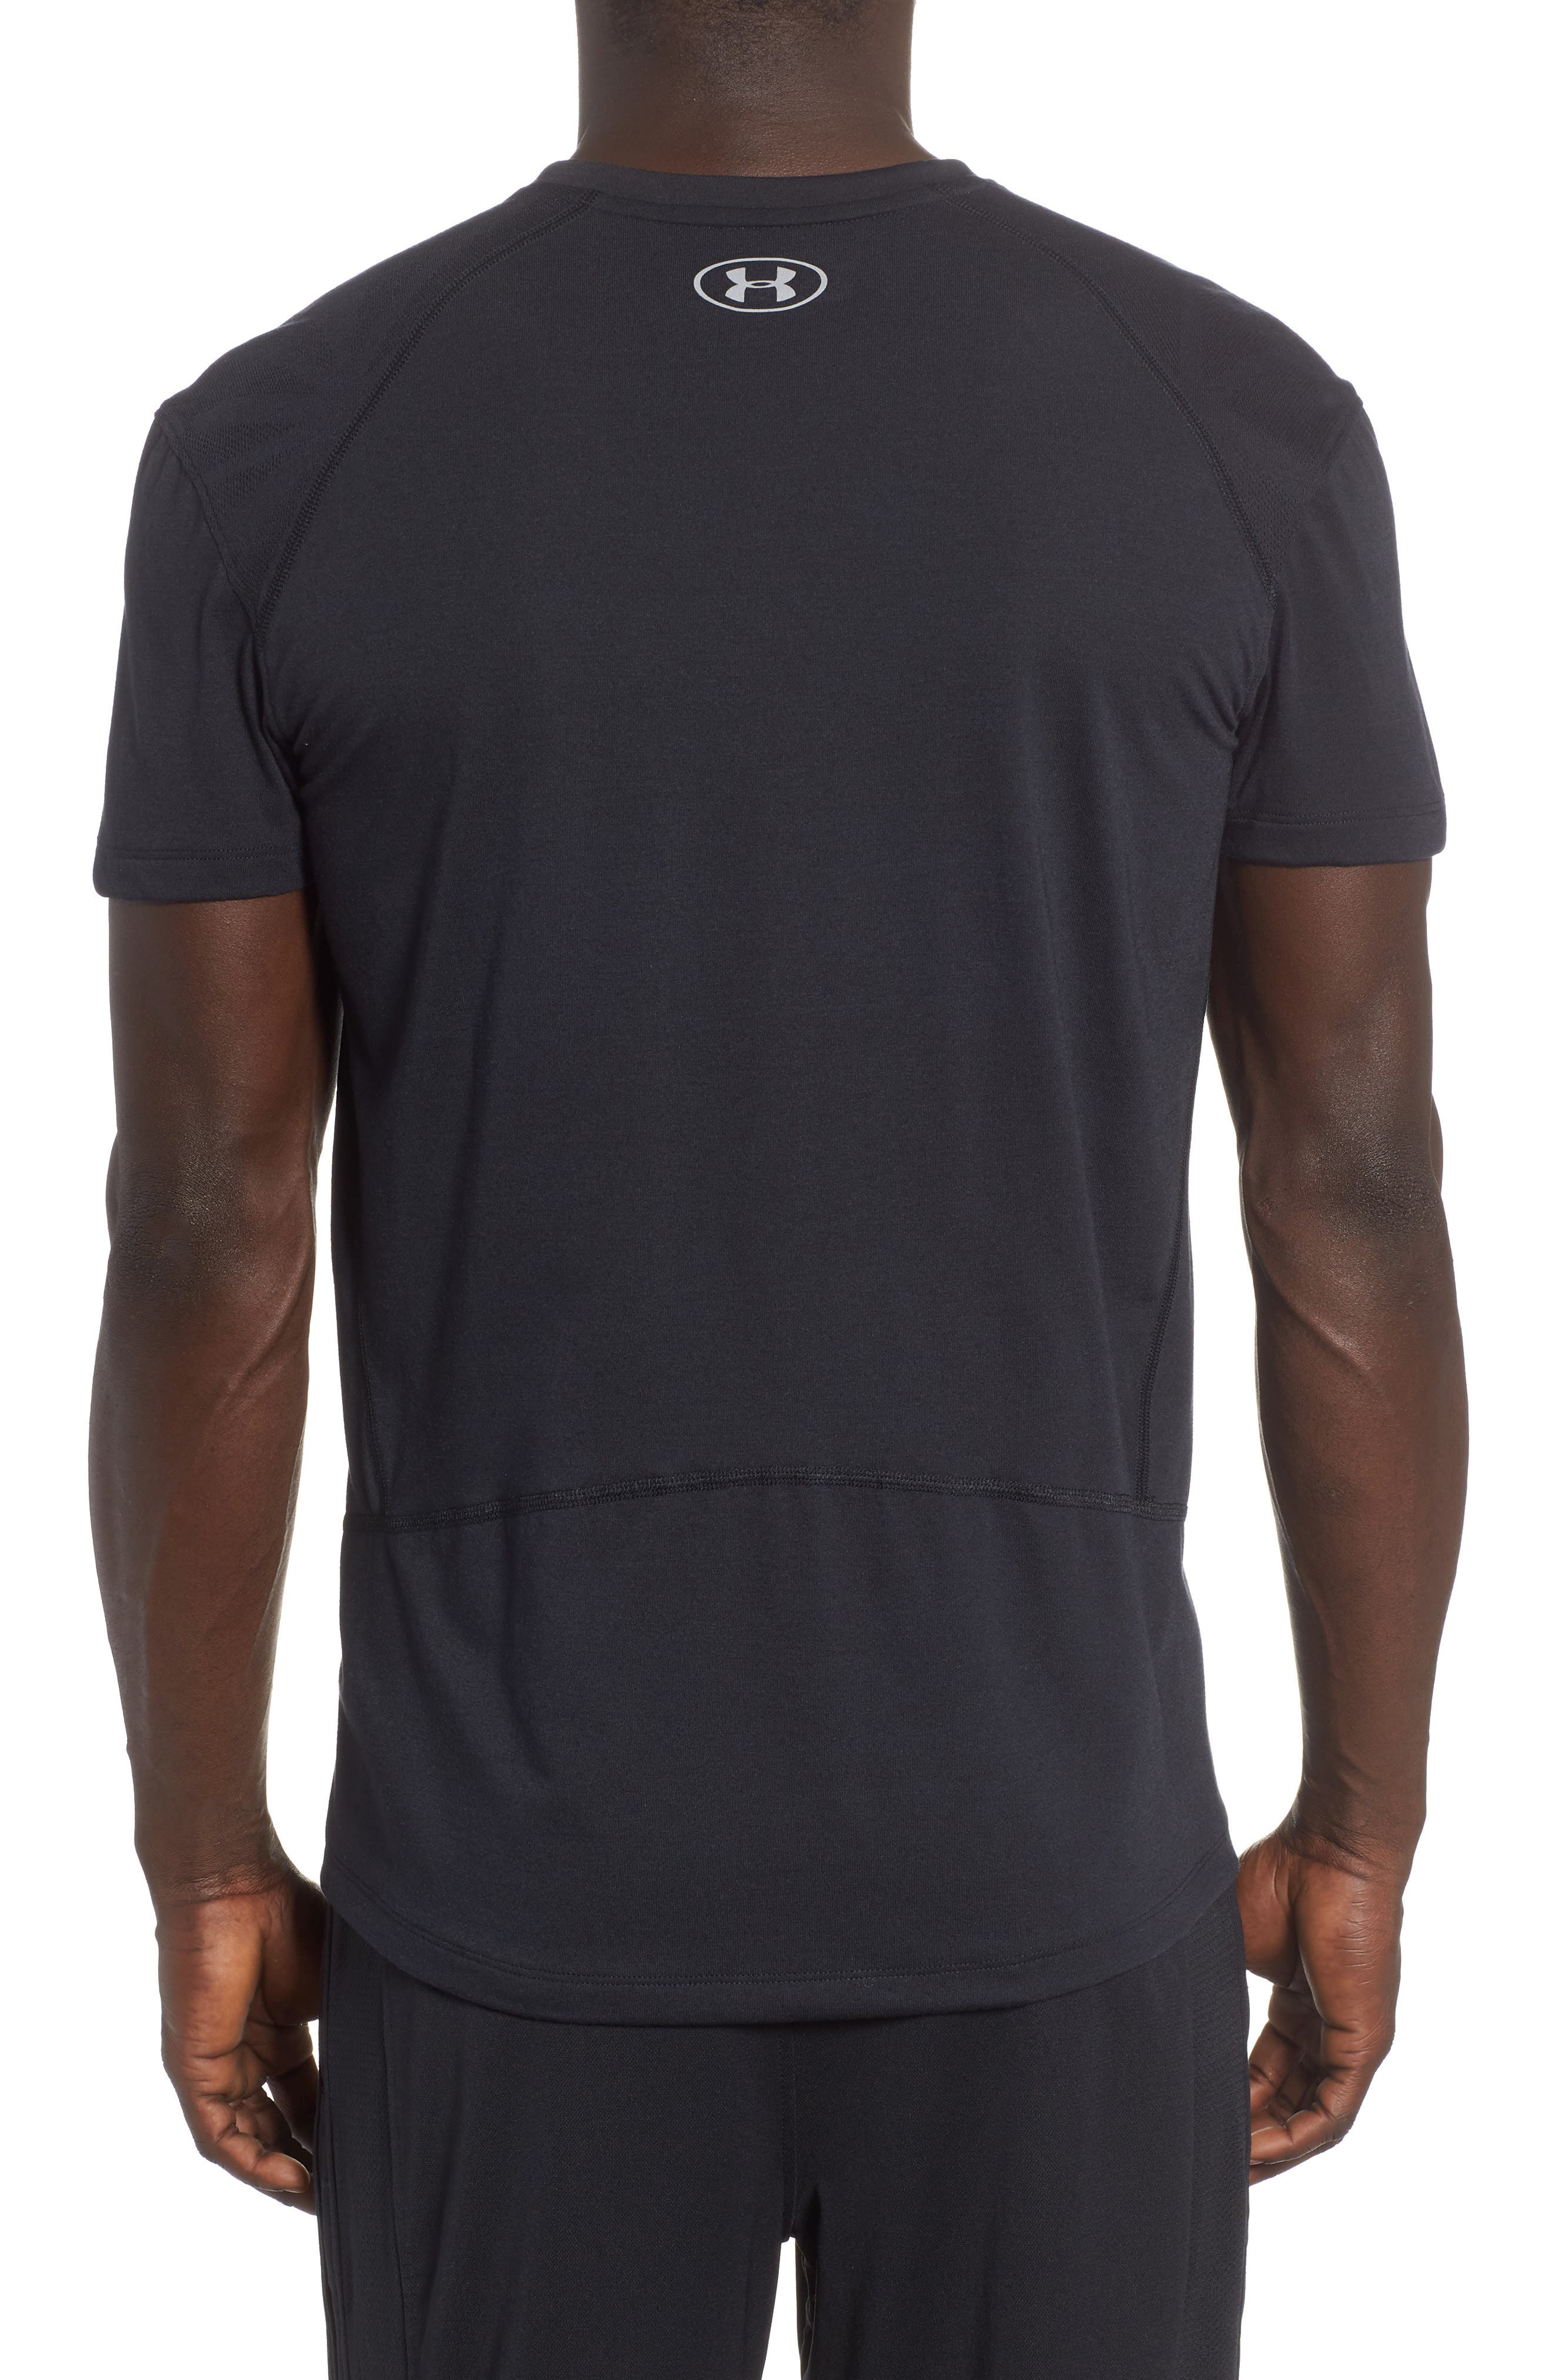 Microthread Swyft V-Neck T-Shirt,                             Alternate thumbnail 2, color,                             BLACK/ BLACK/ REFLECTIVE